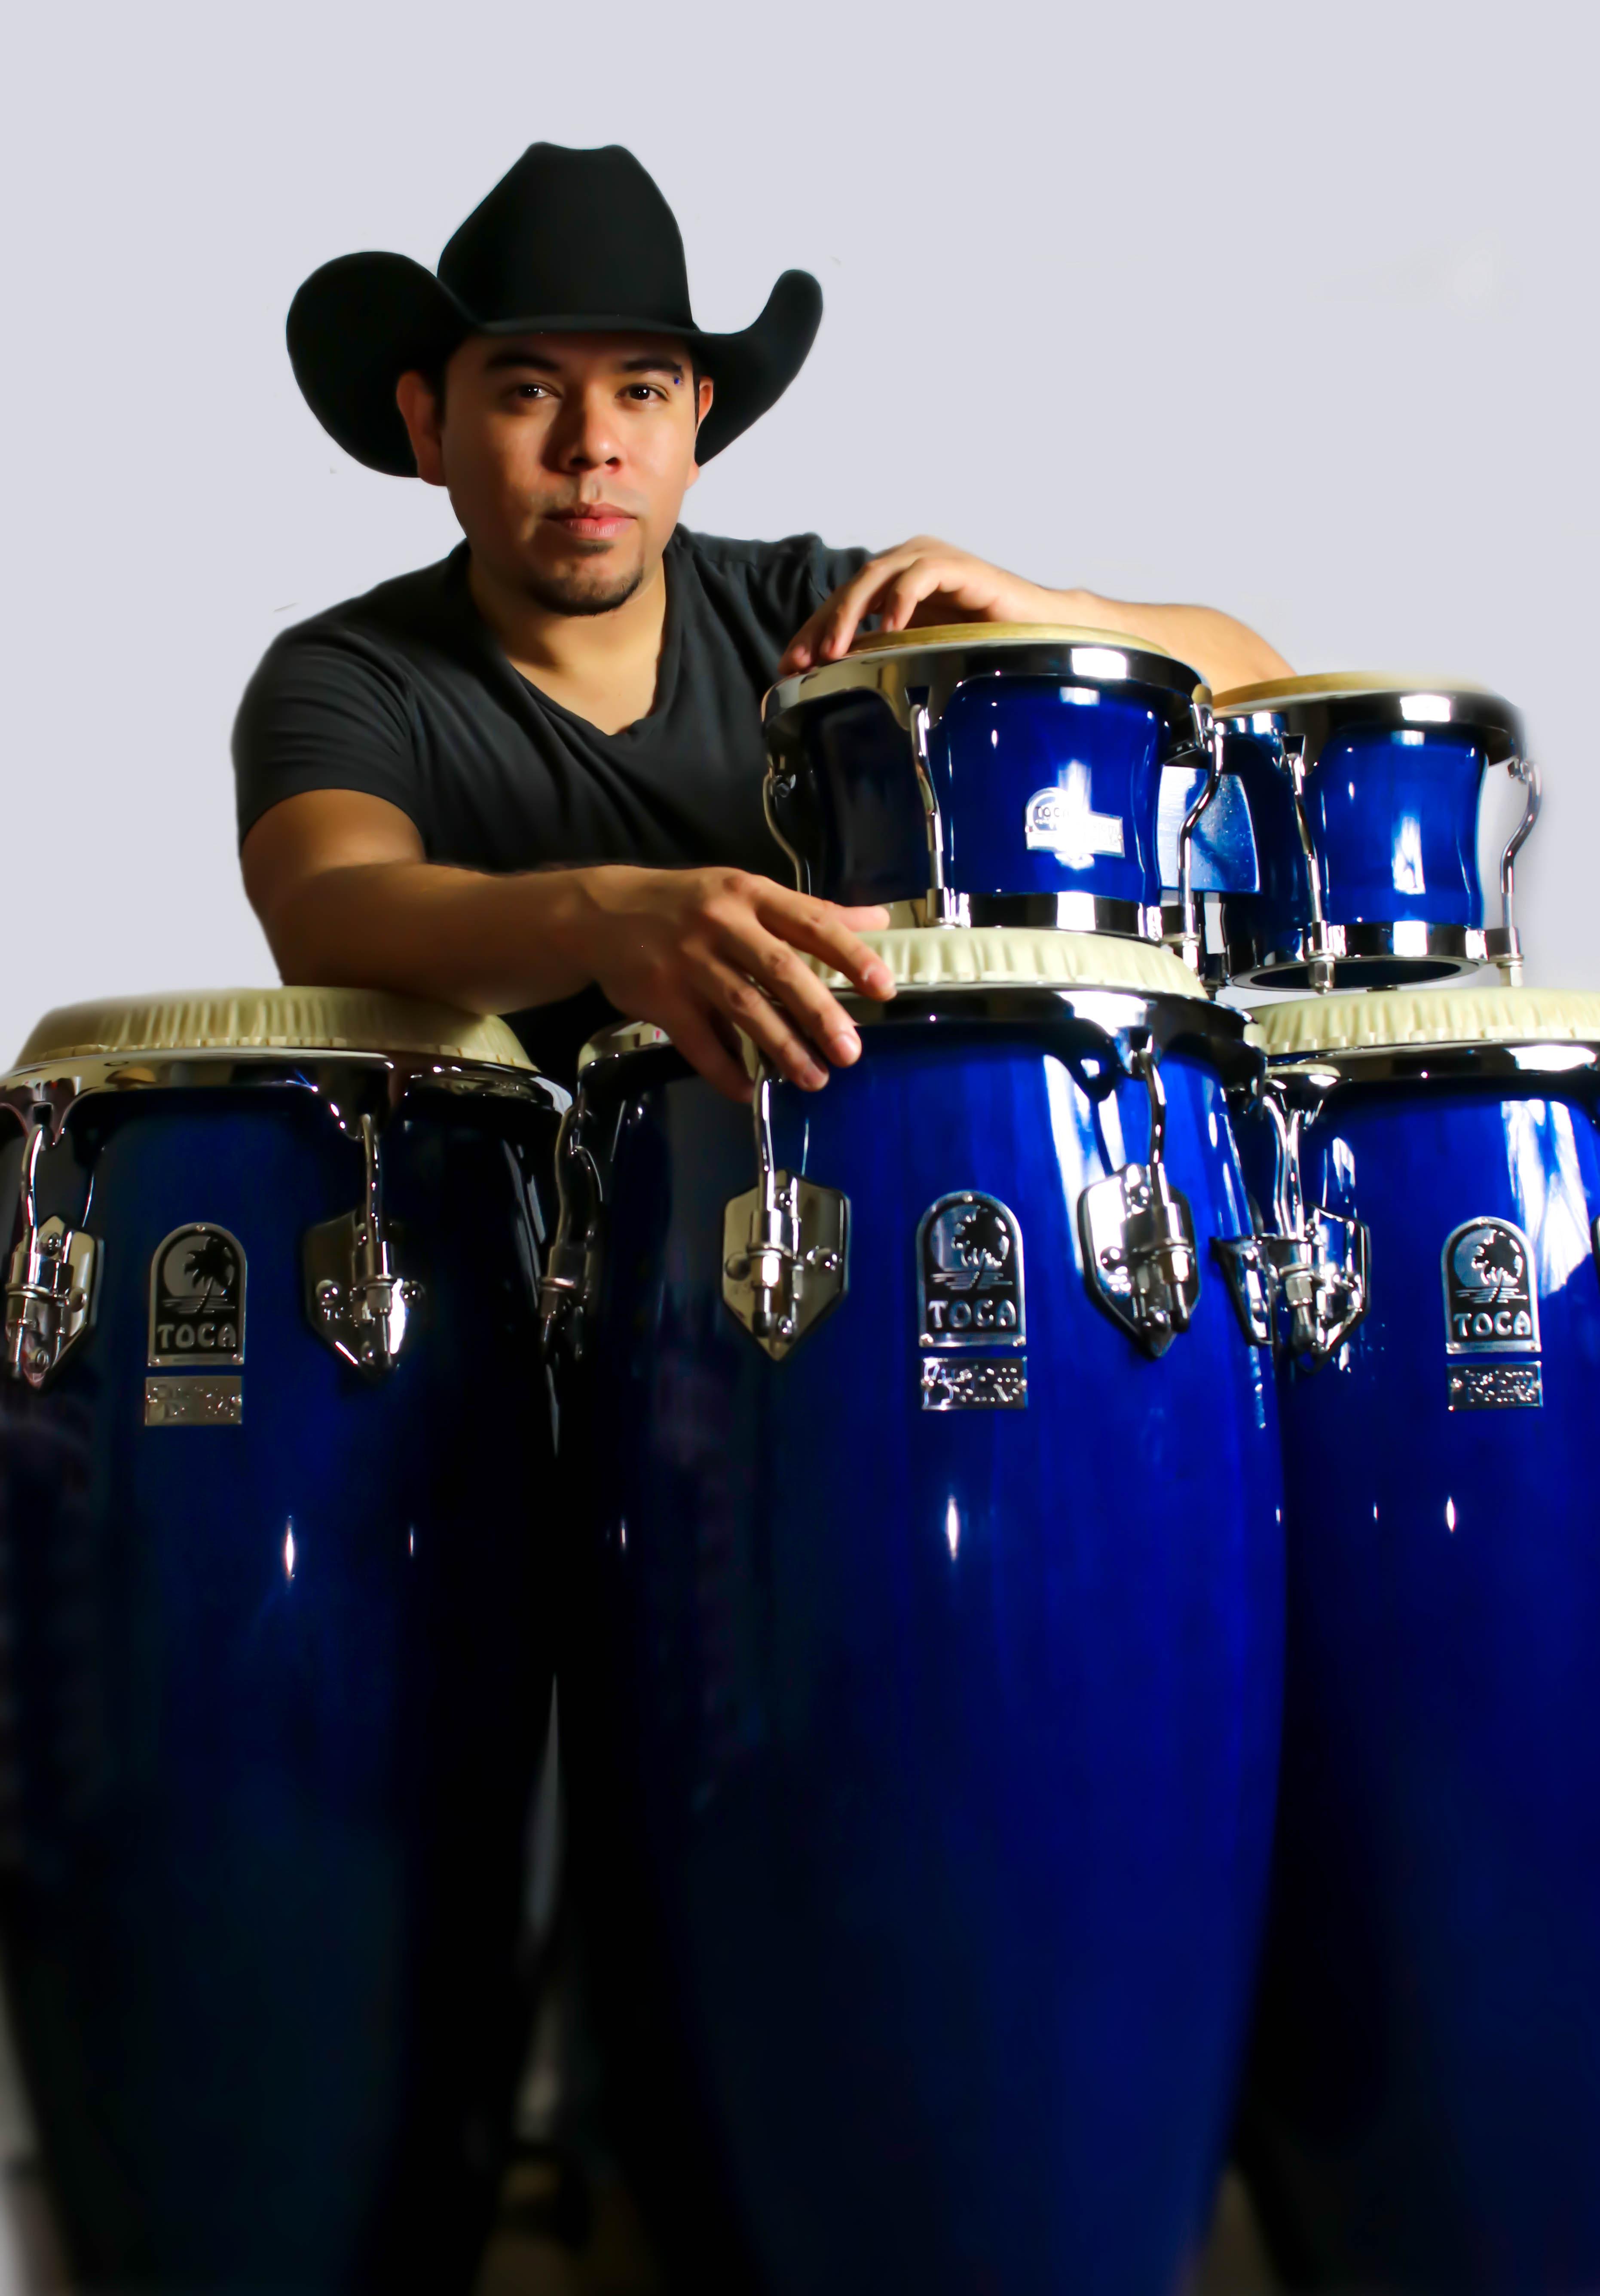 Arturo Sergio Solis